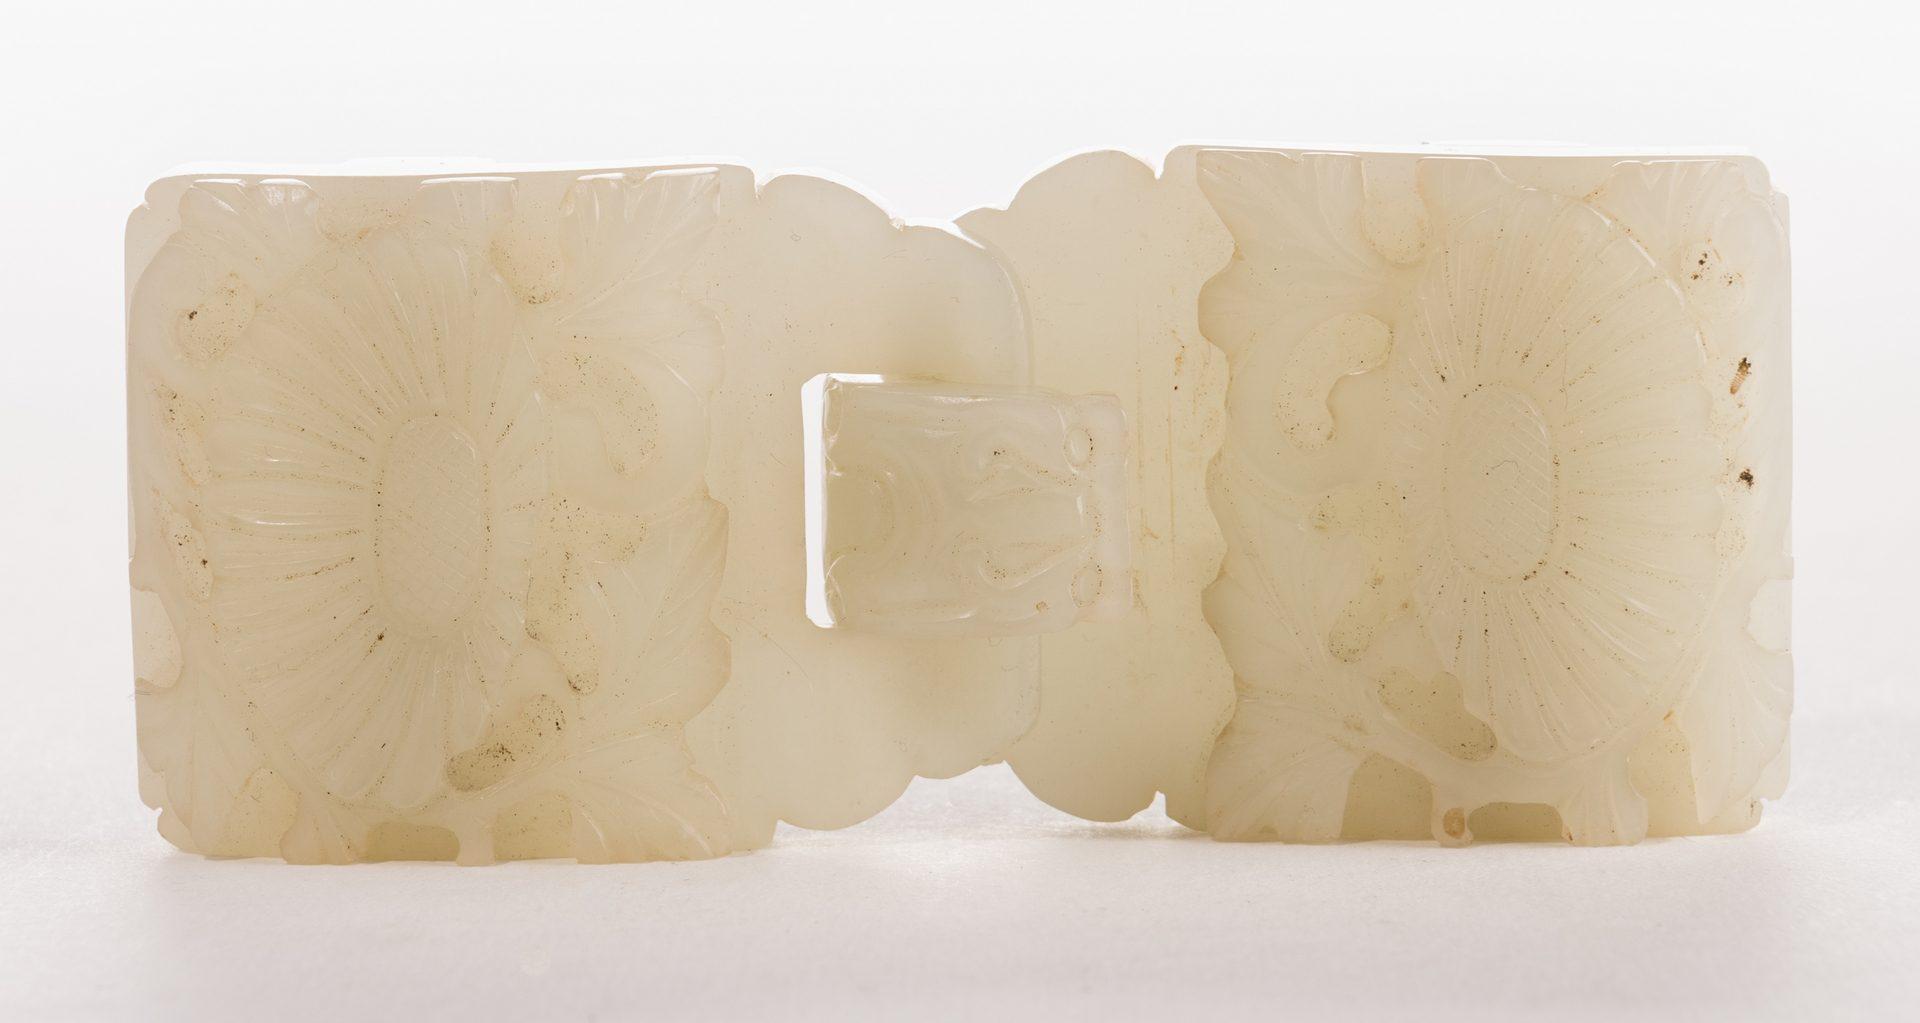 Lot 9: Chinese Celadon Jade Double Belt Buckle